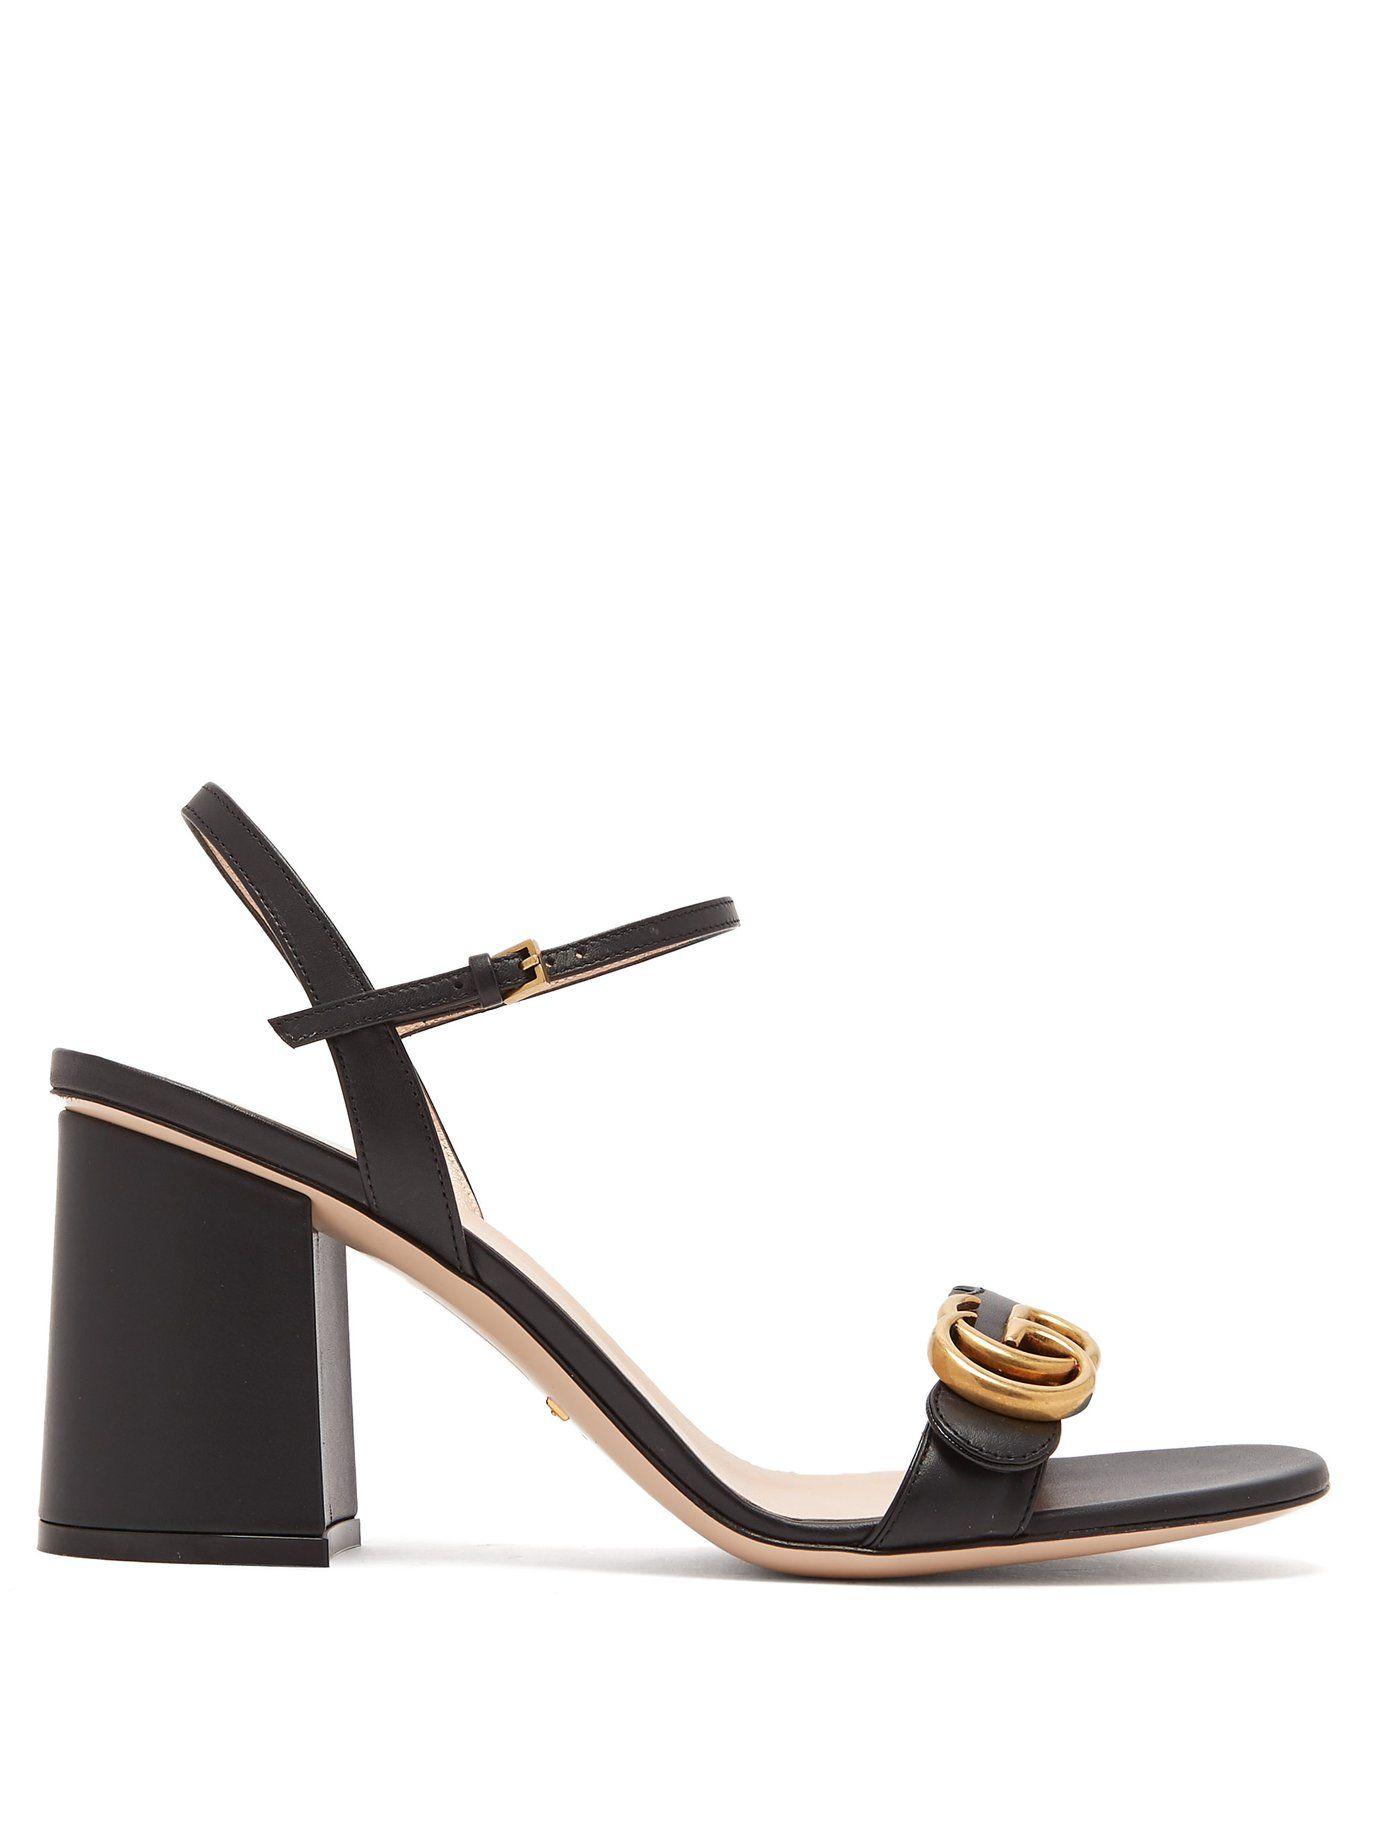 a7b911209dbcc GG Marmont block-heel sandals